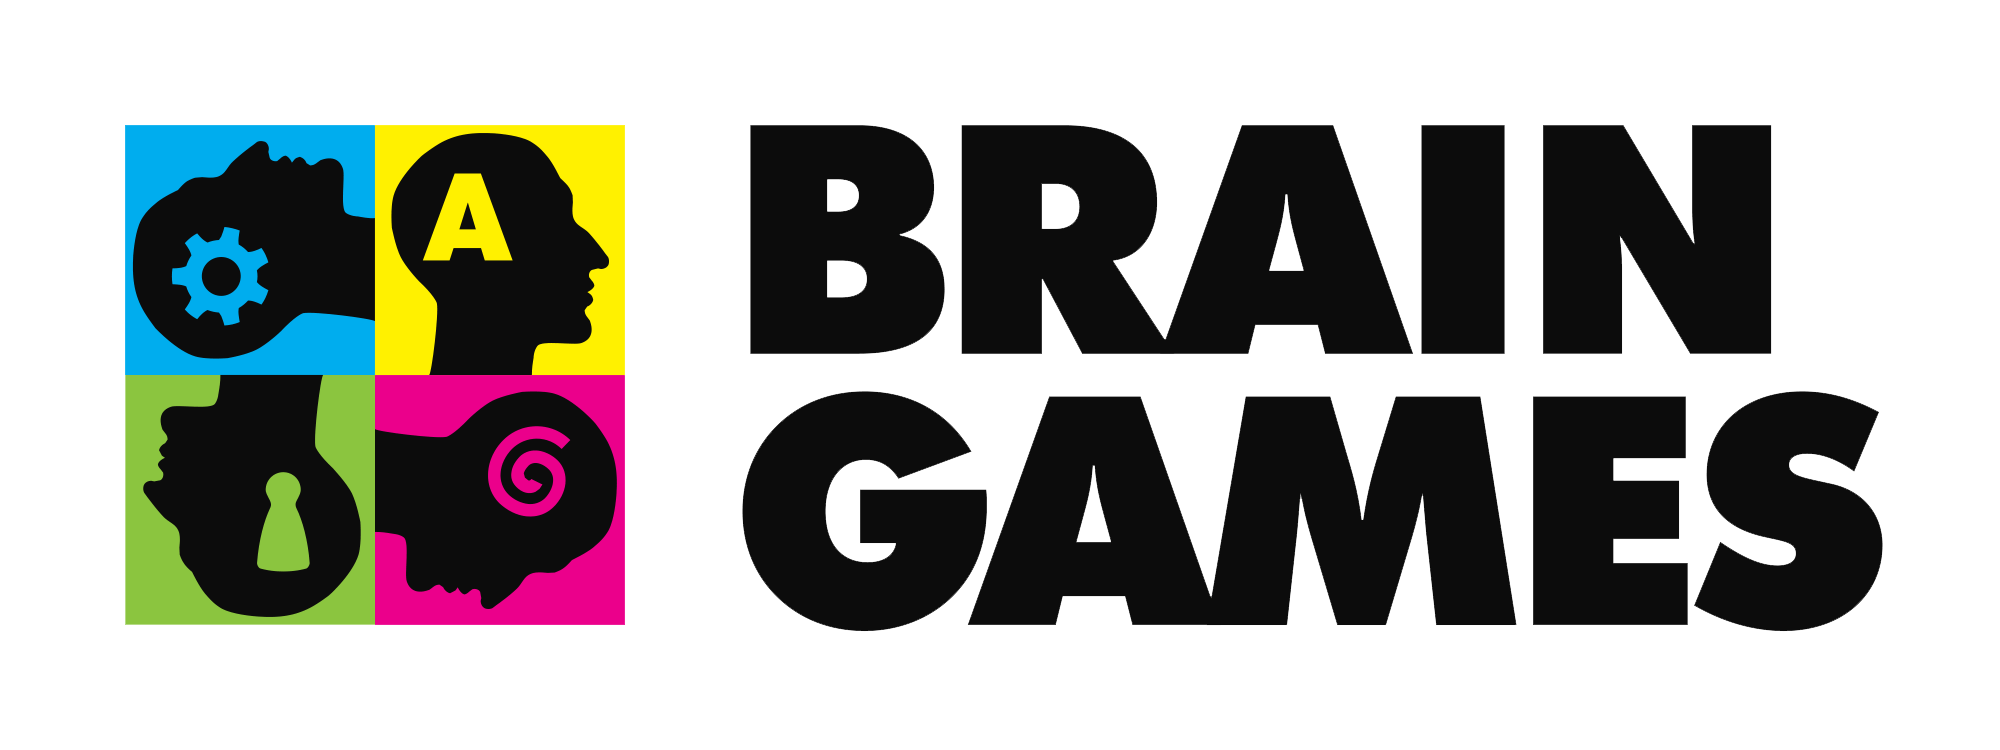 https://www.brain-games.lv/